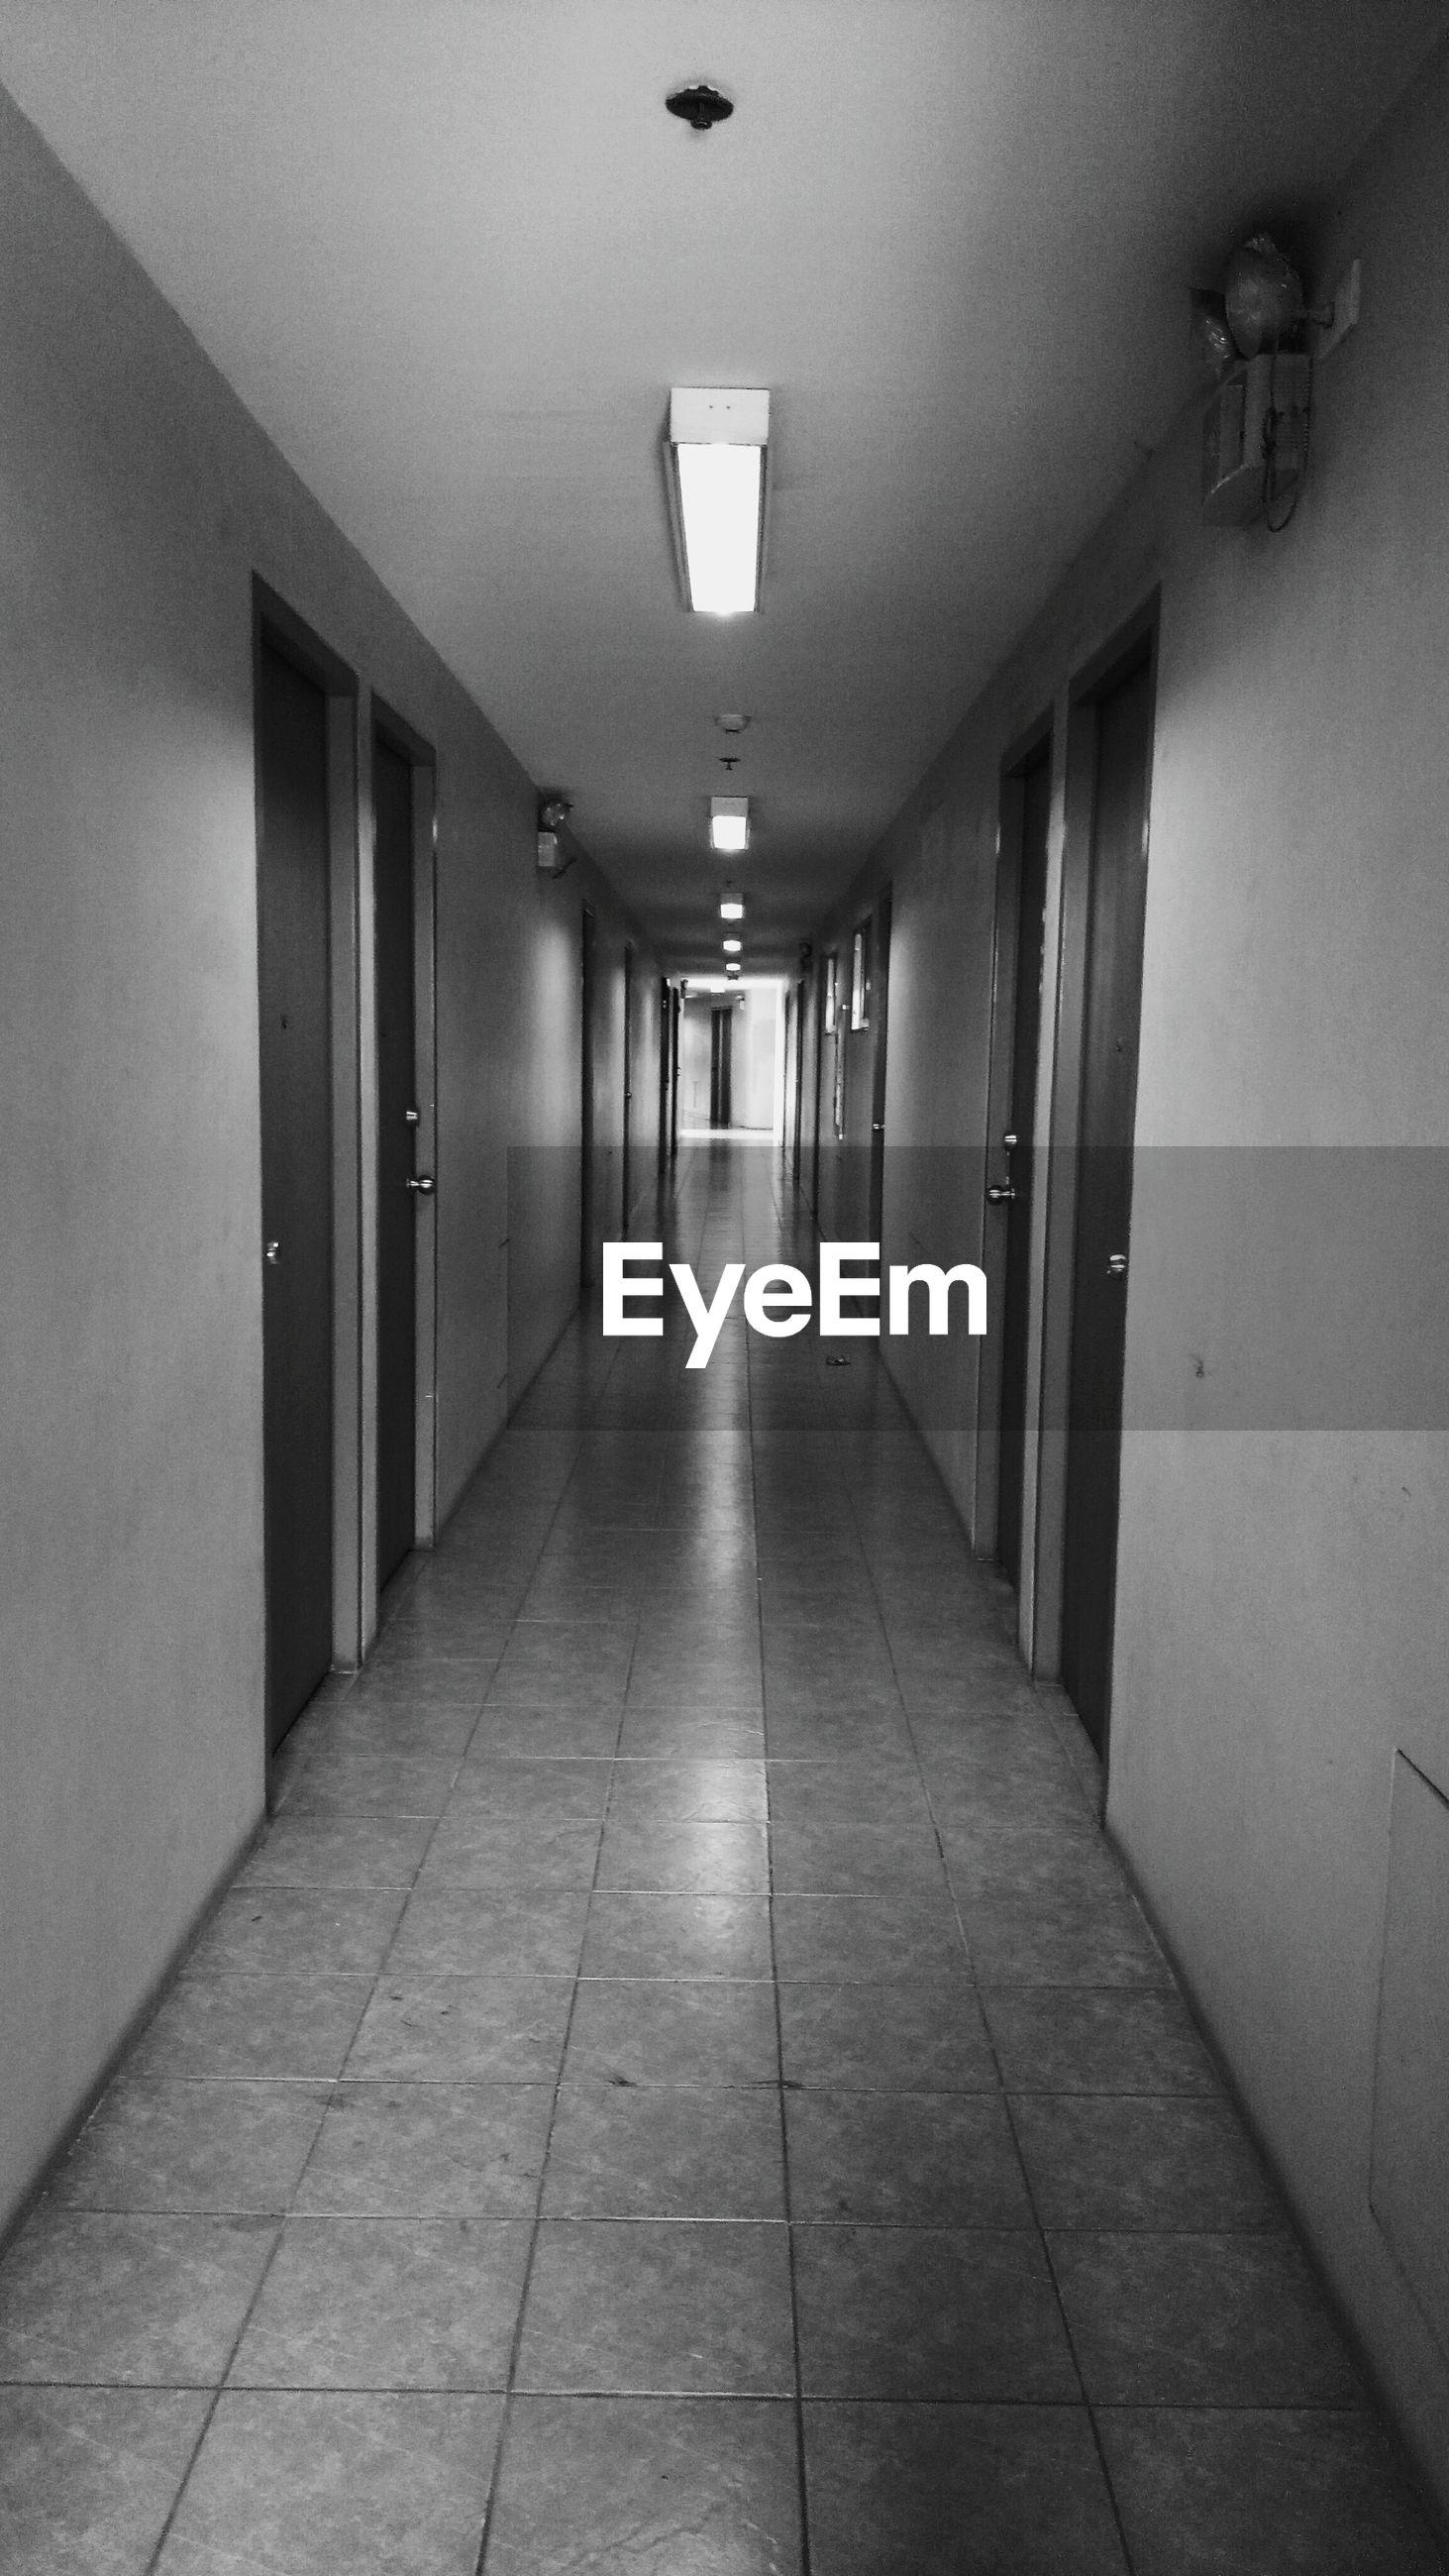 corridor, door, the way forward, tiled floor, indoors, illuminated, no people, architecture, day, police station